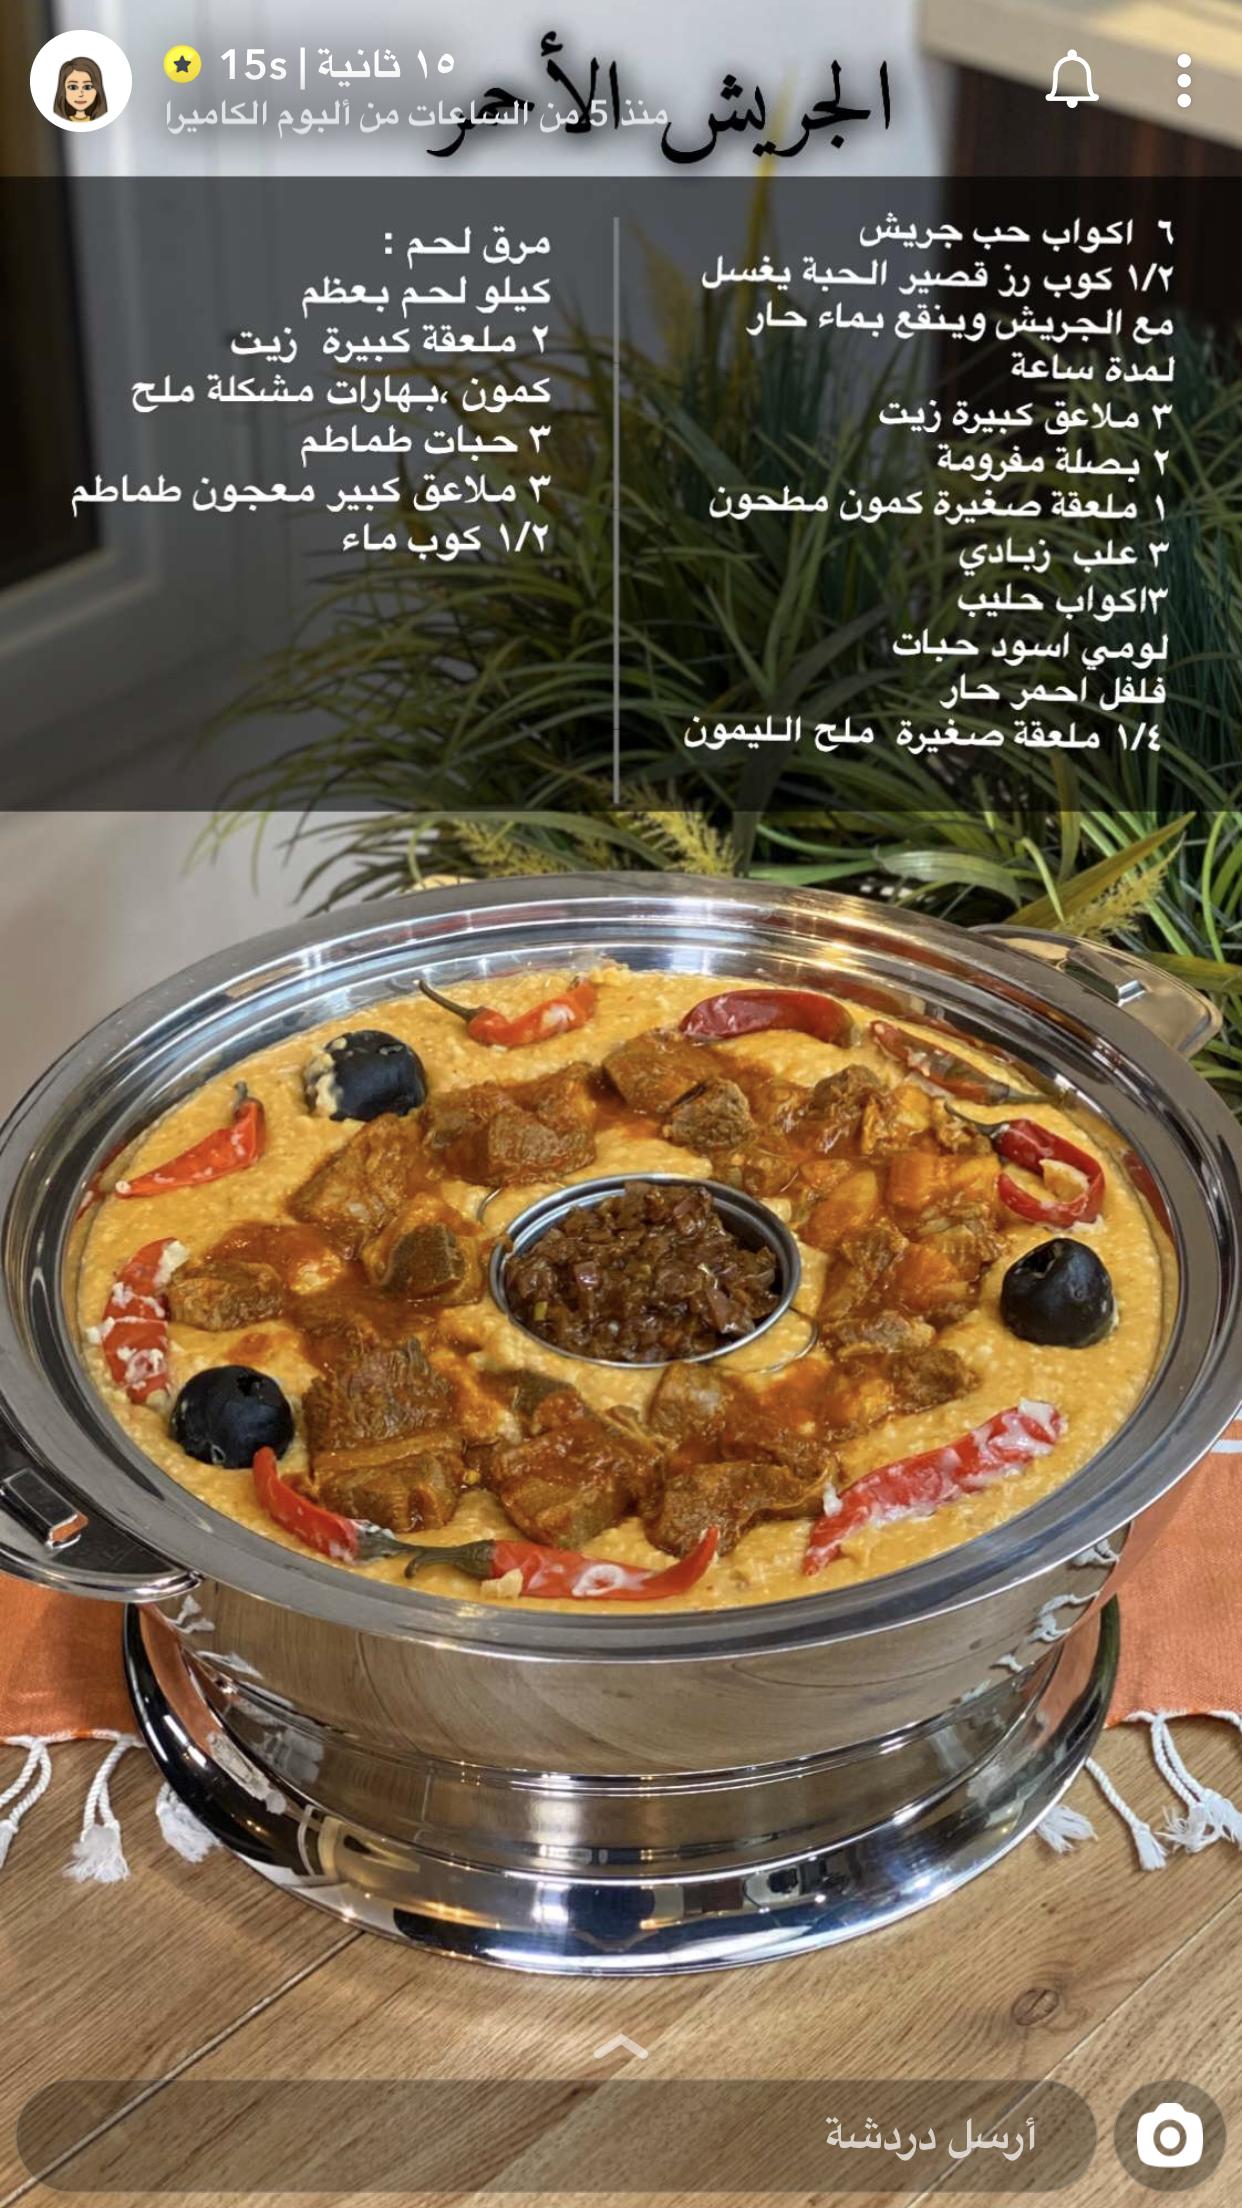 Pin By Zahra Style On اكلات شعبيه In 2021 Libyan Food Food Receipes Diy Food Recipes